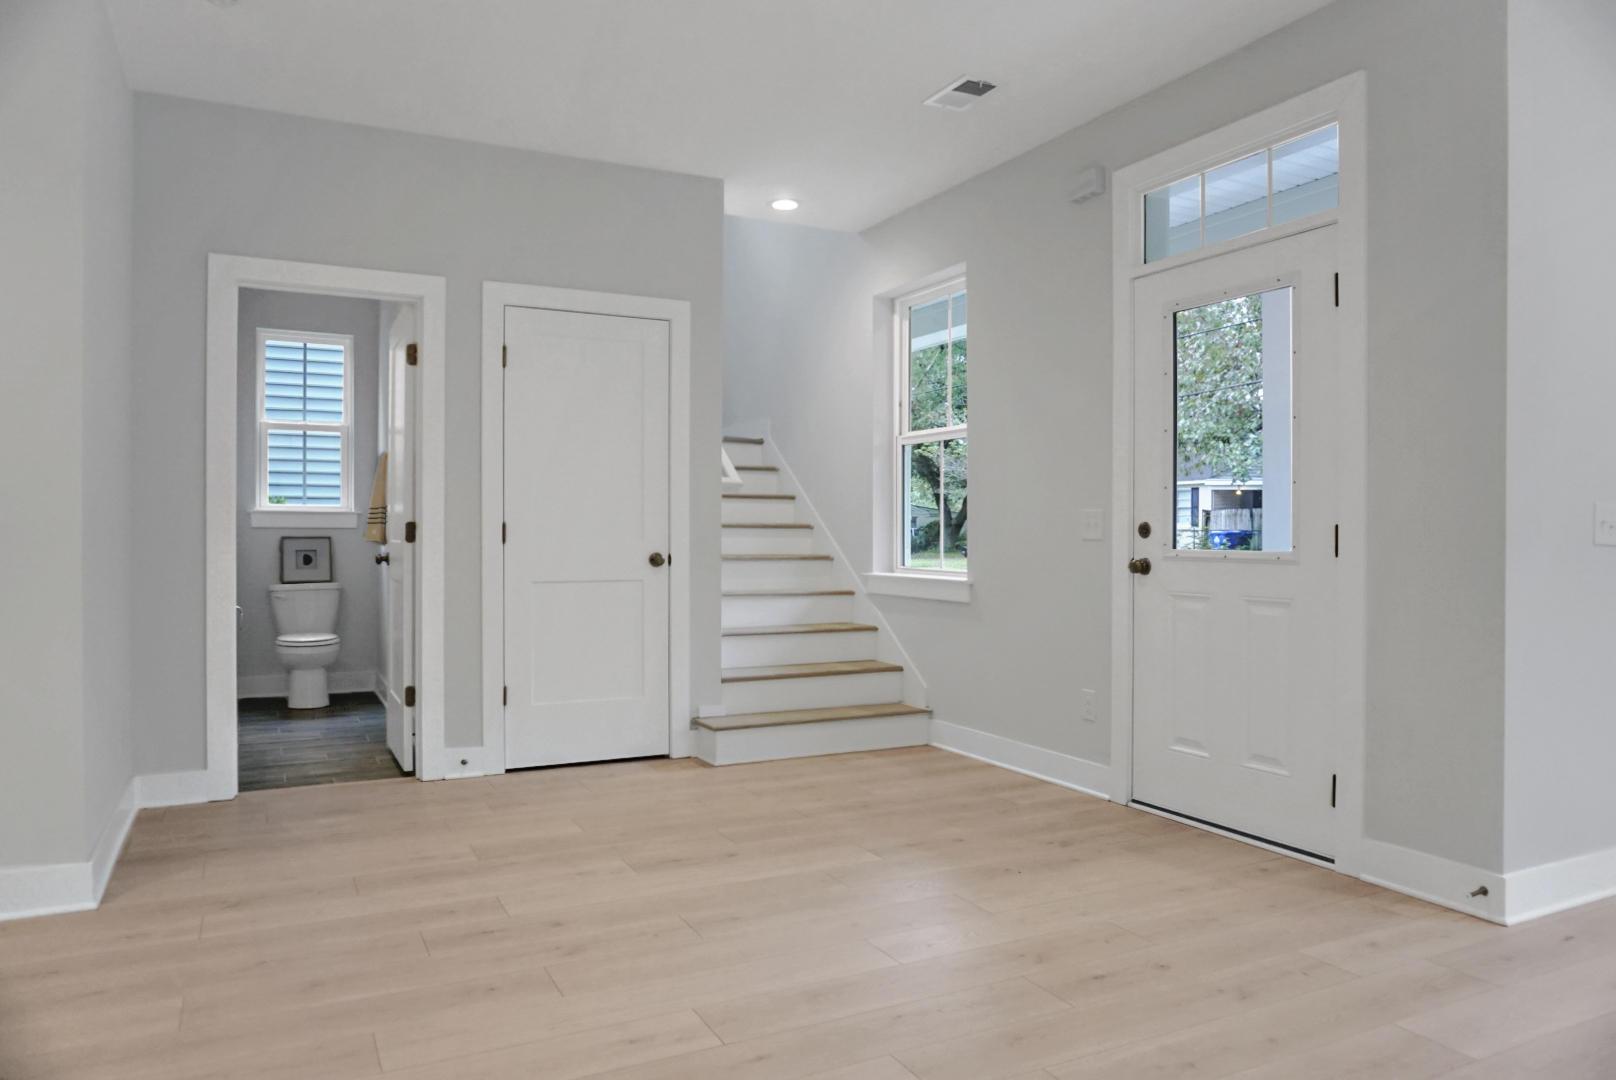 Dogwood Commons Homes For Sale - 1862 Dogwood Road, Charleston, SC - 8